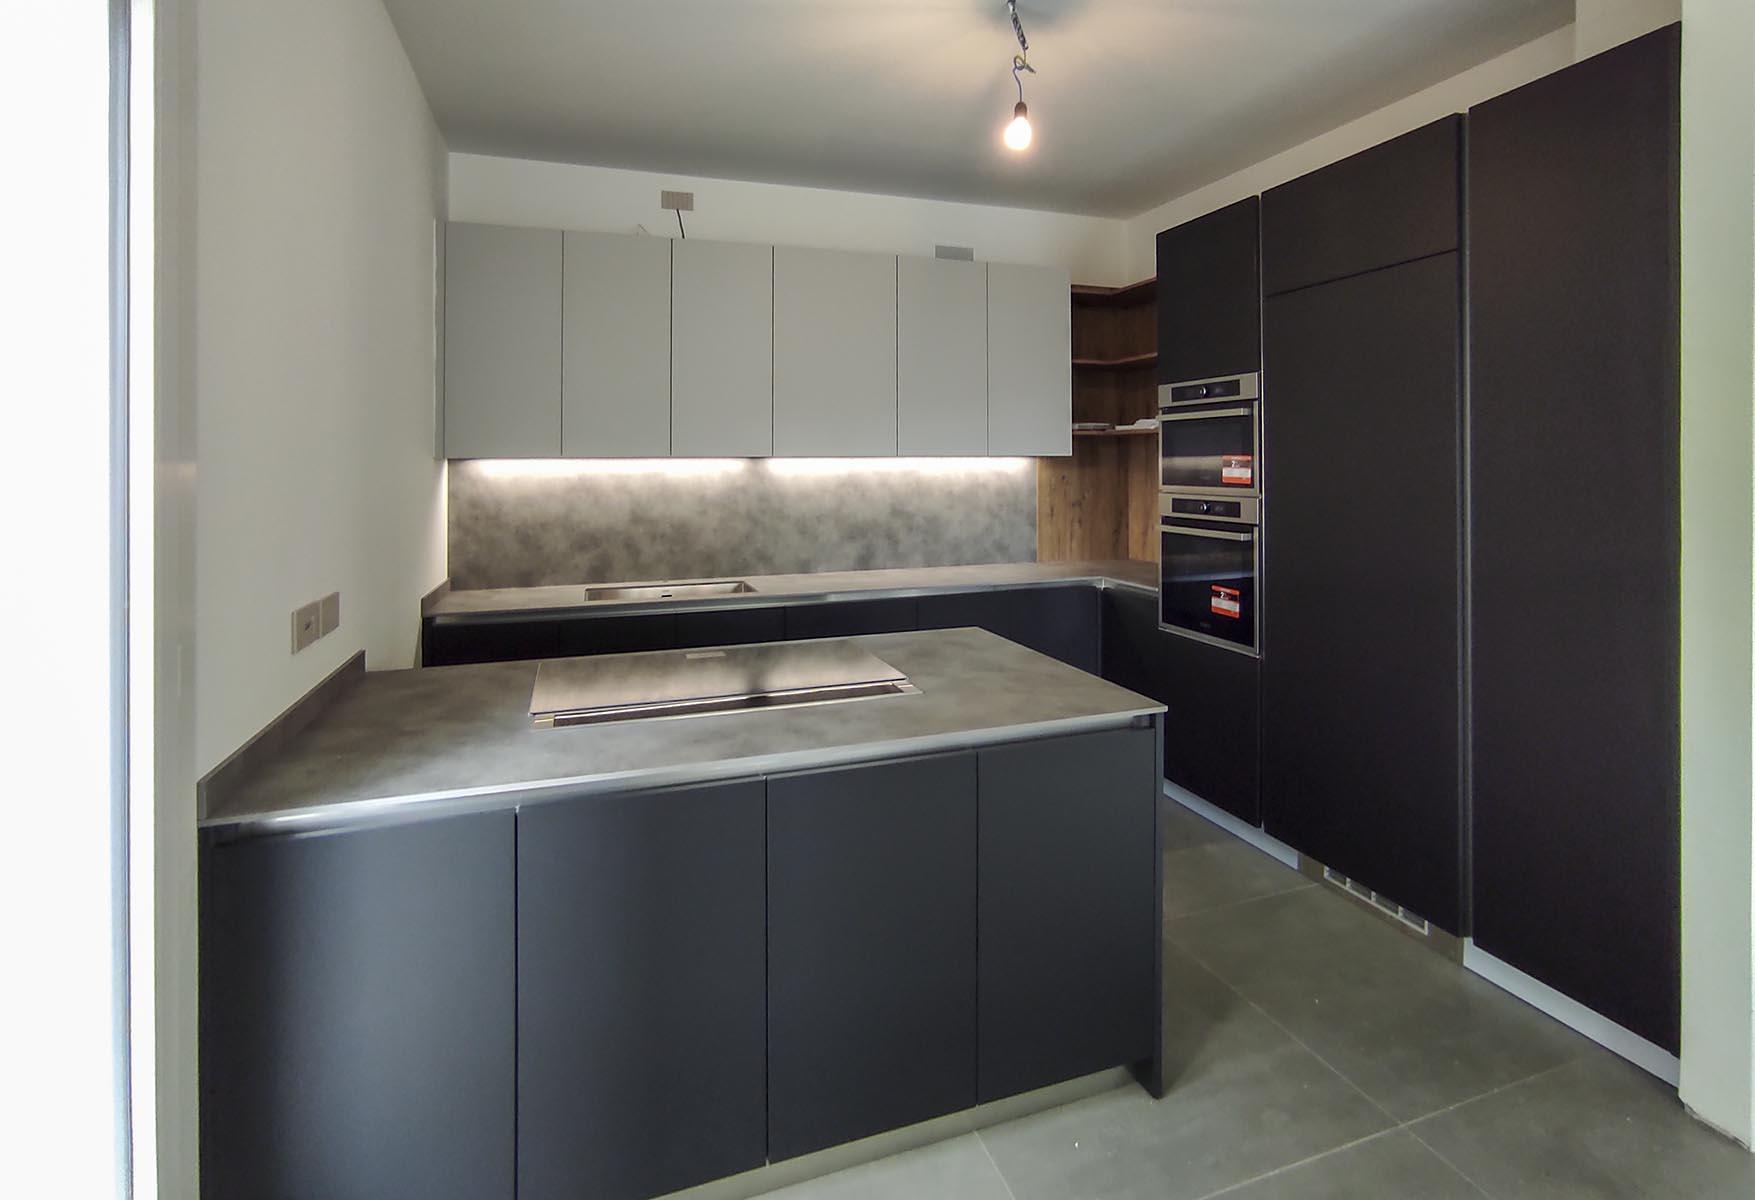 Cucina abitabile con penisola cottura